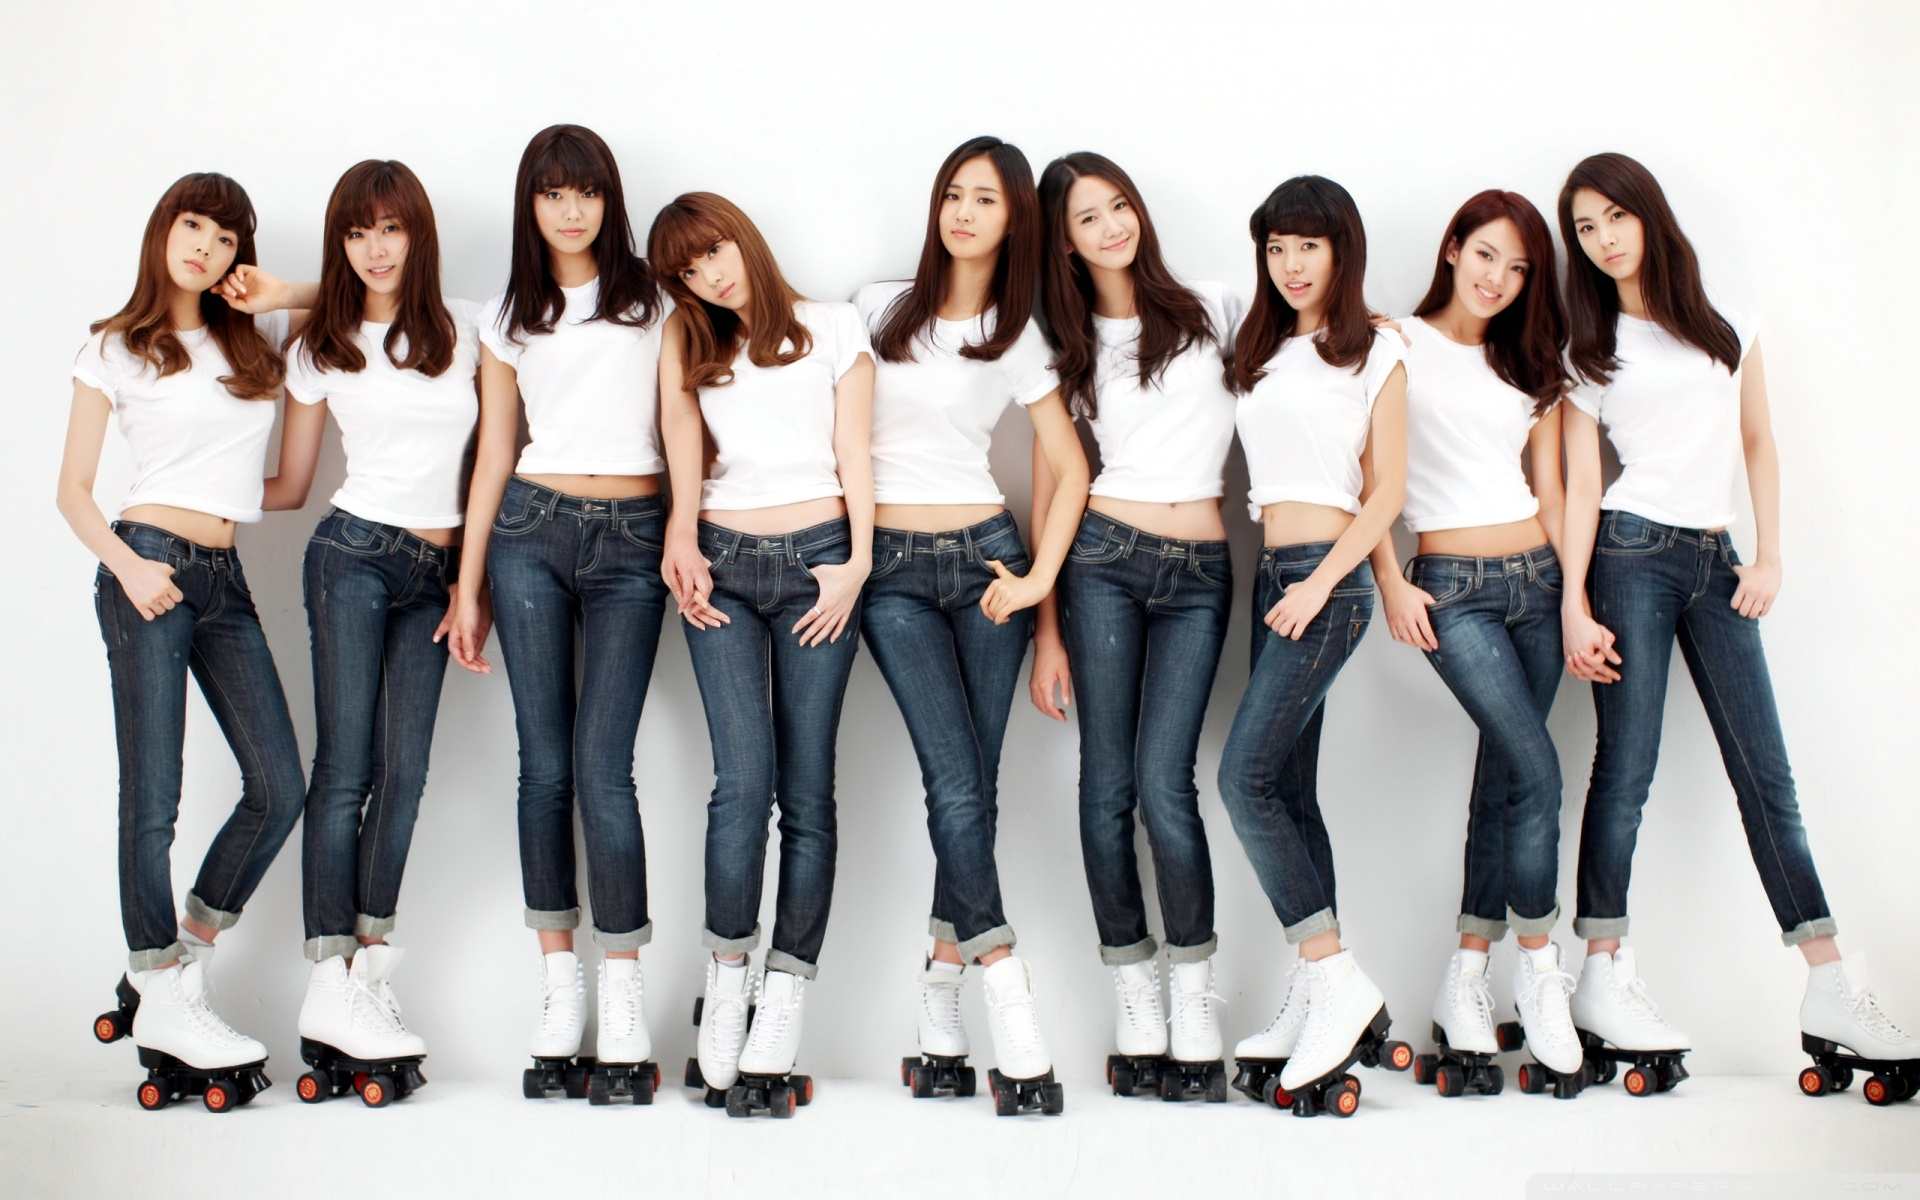 Girls Generation 08 wallpaper Gallery 1920x1200